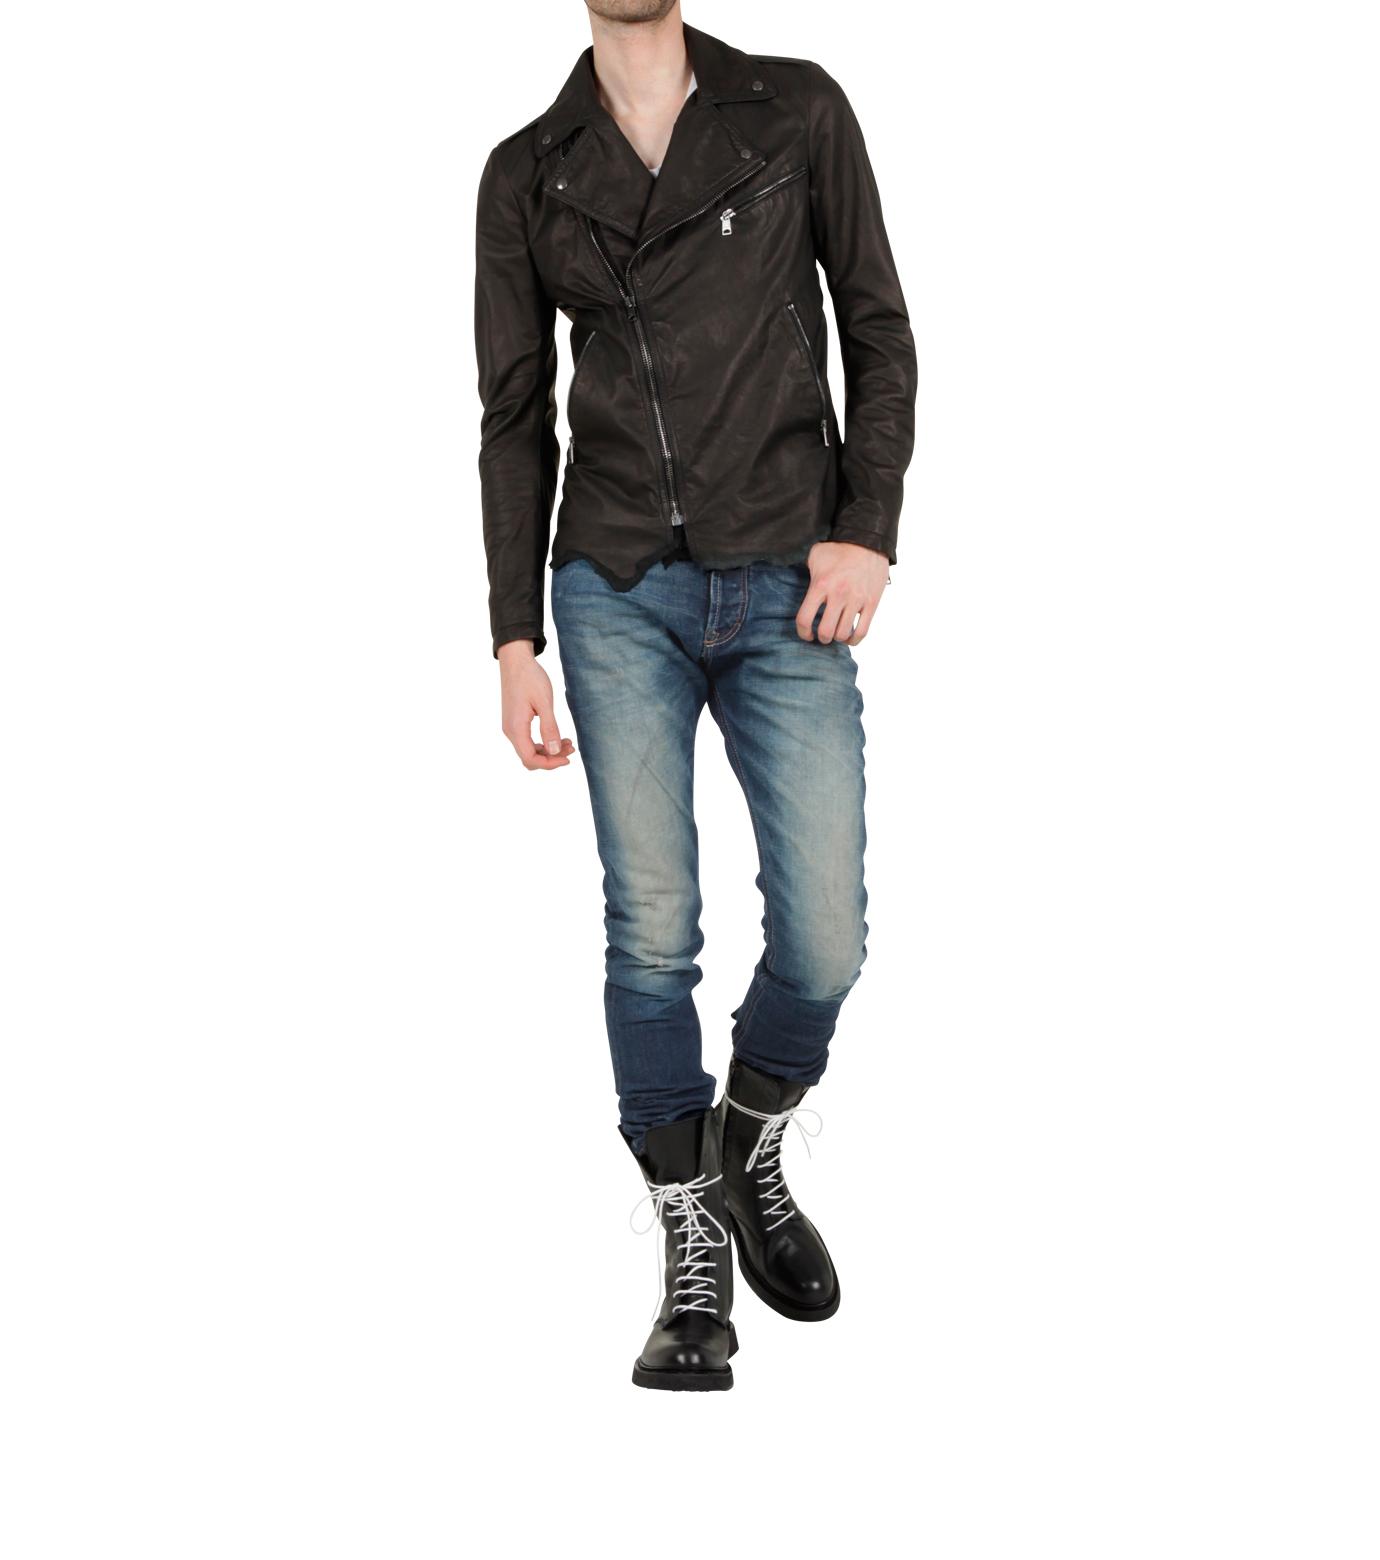 Alexander McQueen(アレキサンダーマックイーン)のCheck Riders-BLACK-261775 拡大詳細画像2